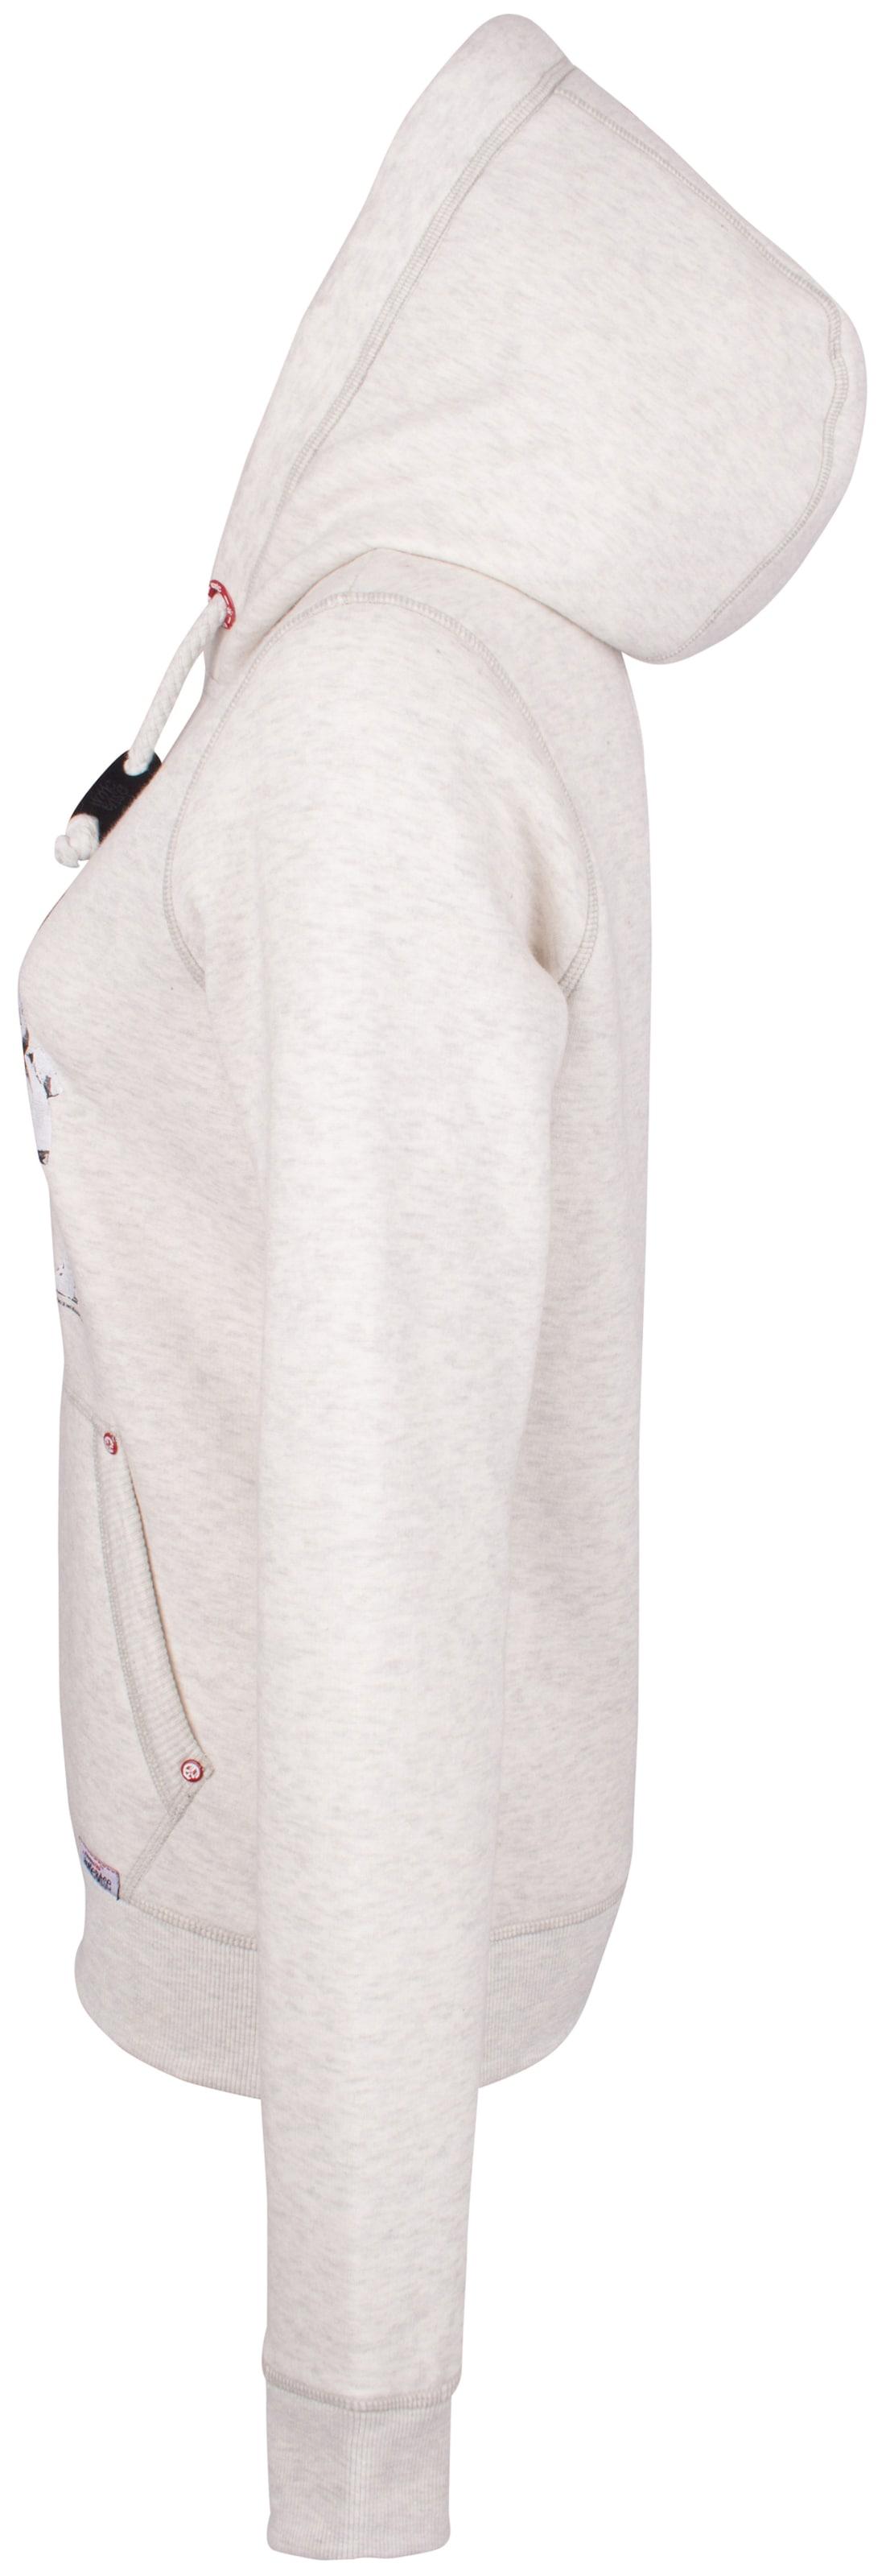 JauneOlive Rouge Homebase En Blanc shirt Sweat Clair OPkwZiXuT